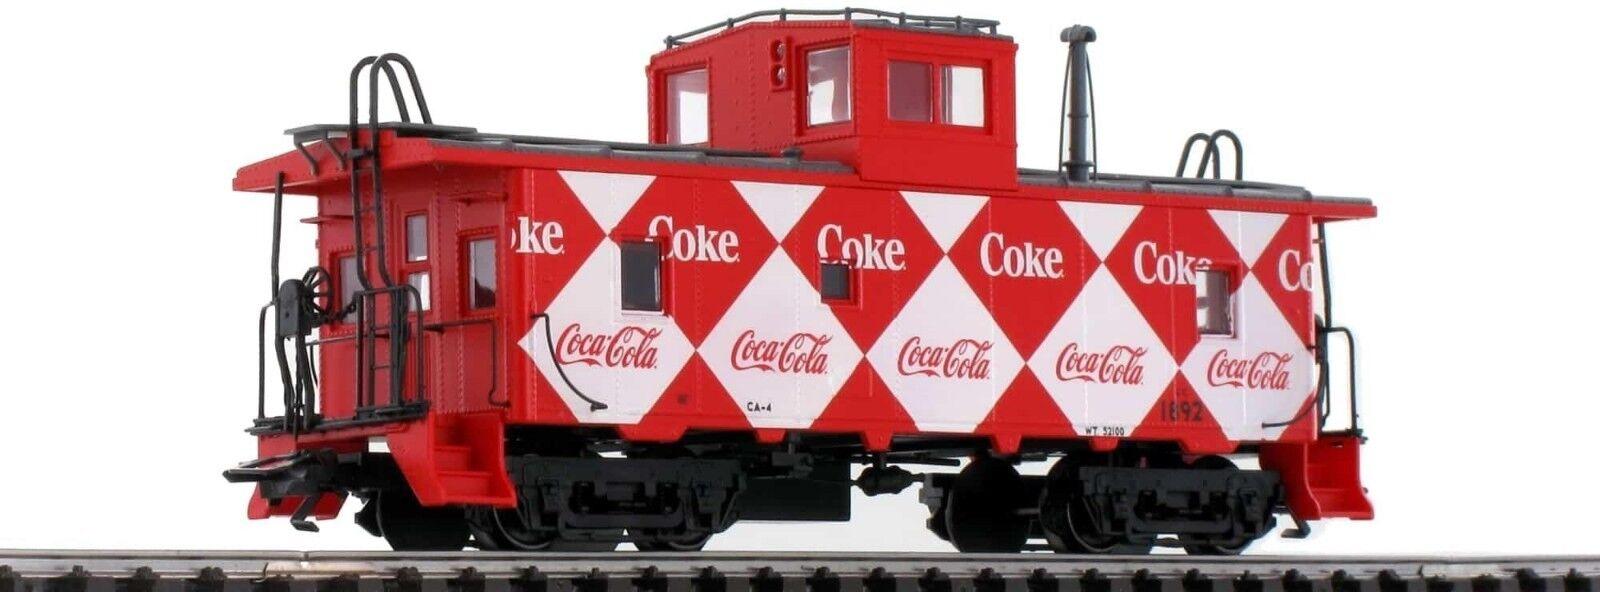 Marklin HO 45708  Type CA-3 CA-4  Caboose  Coca-Cola   Brand New